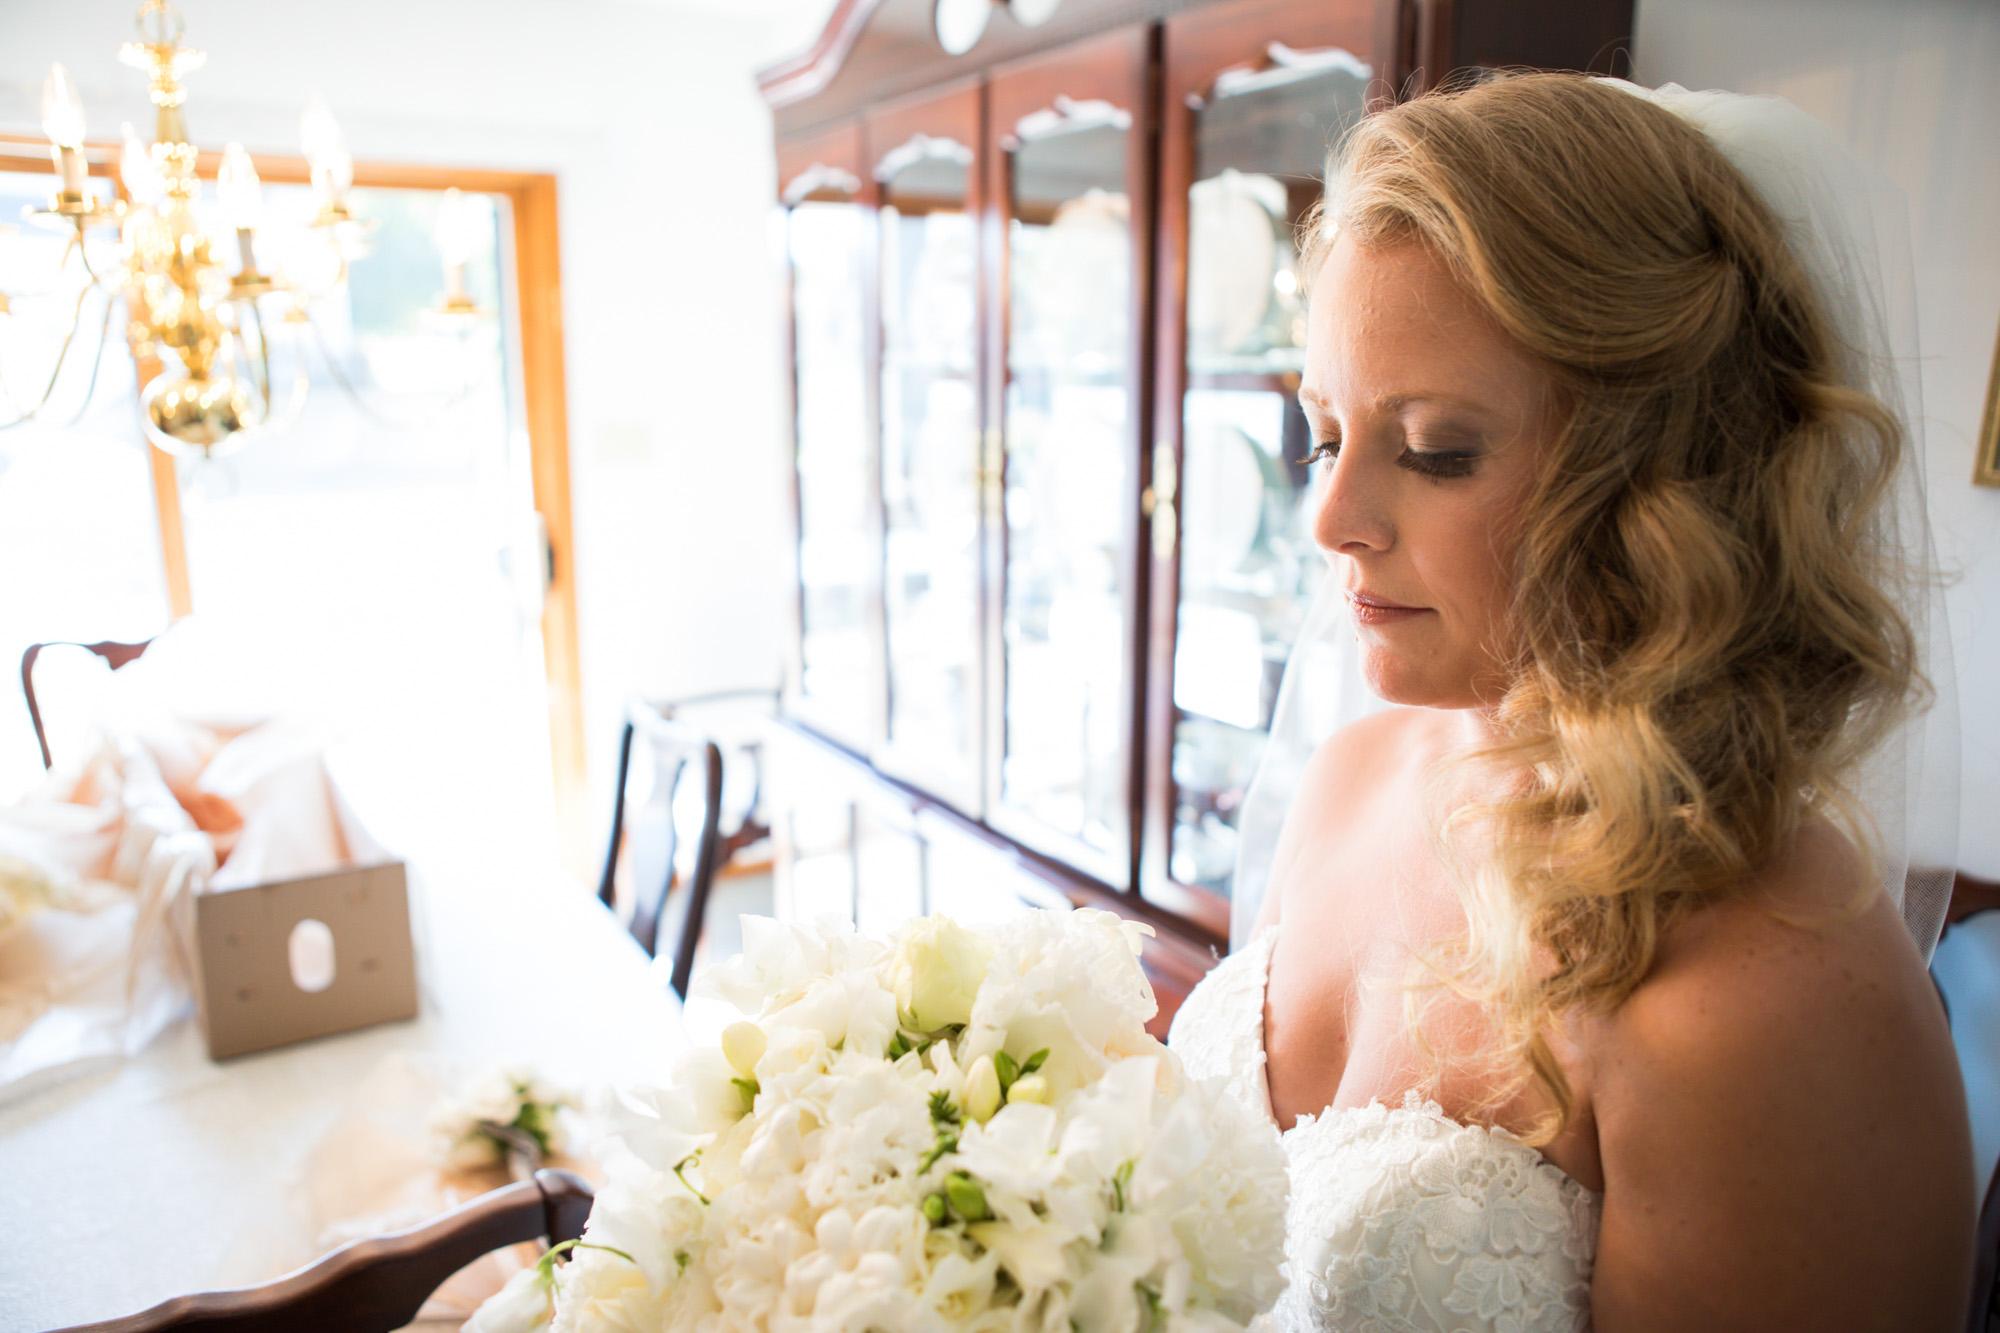 scranton_wedding_photographer_lettieri_pa (4 of 47).jpg